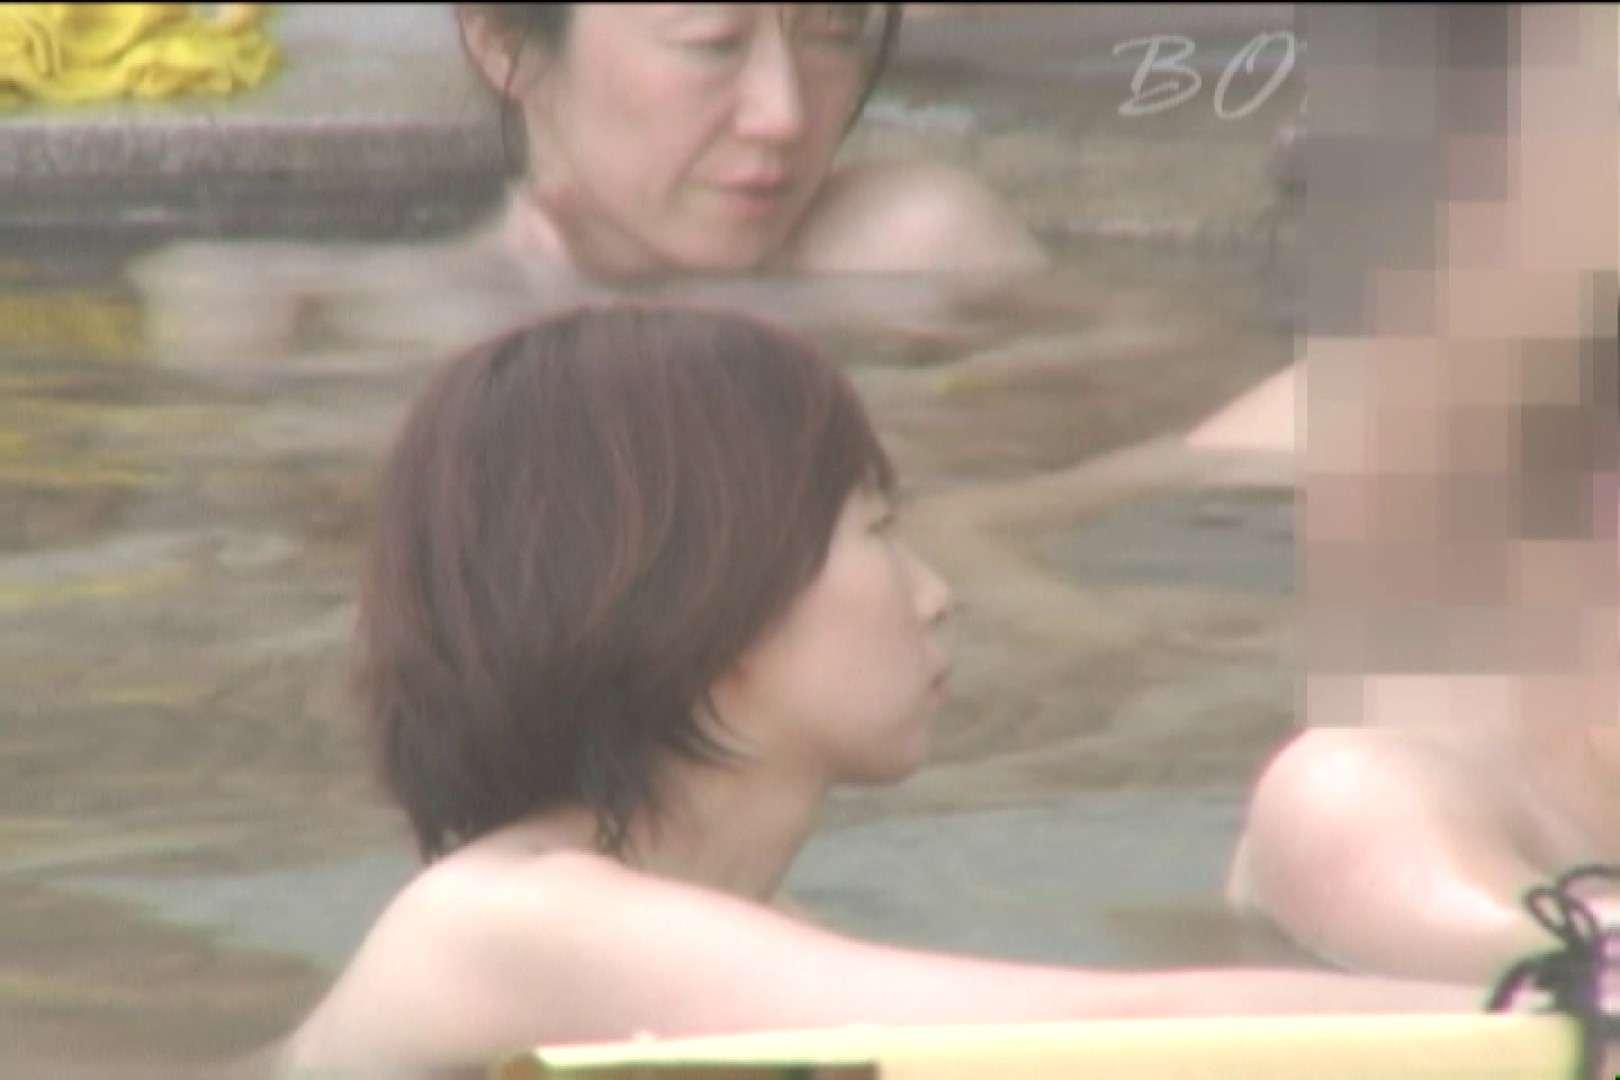 Aquaな露天風呂Vol.476 露天 | OLセックス  80画像 64